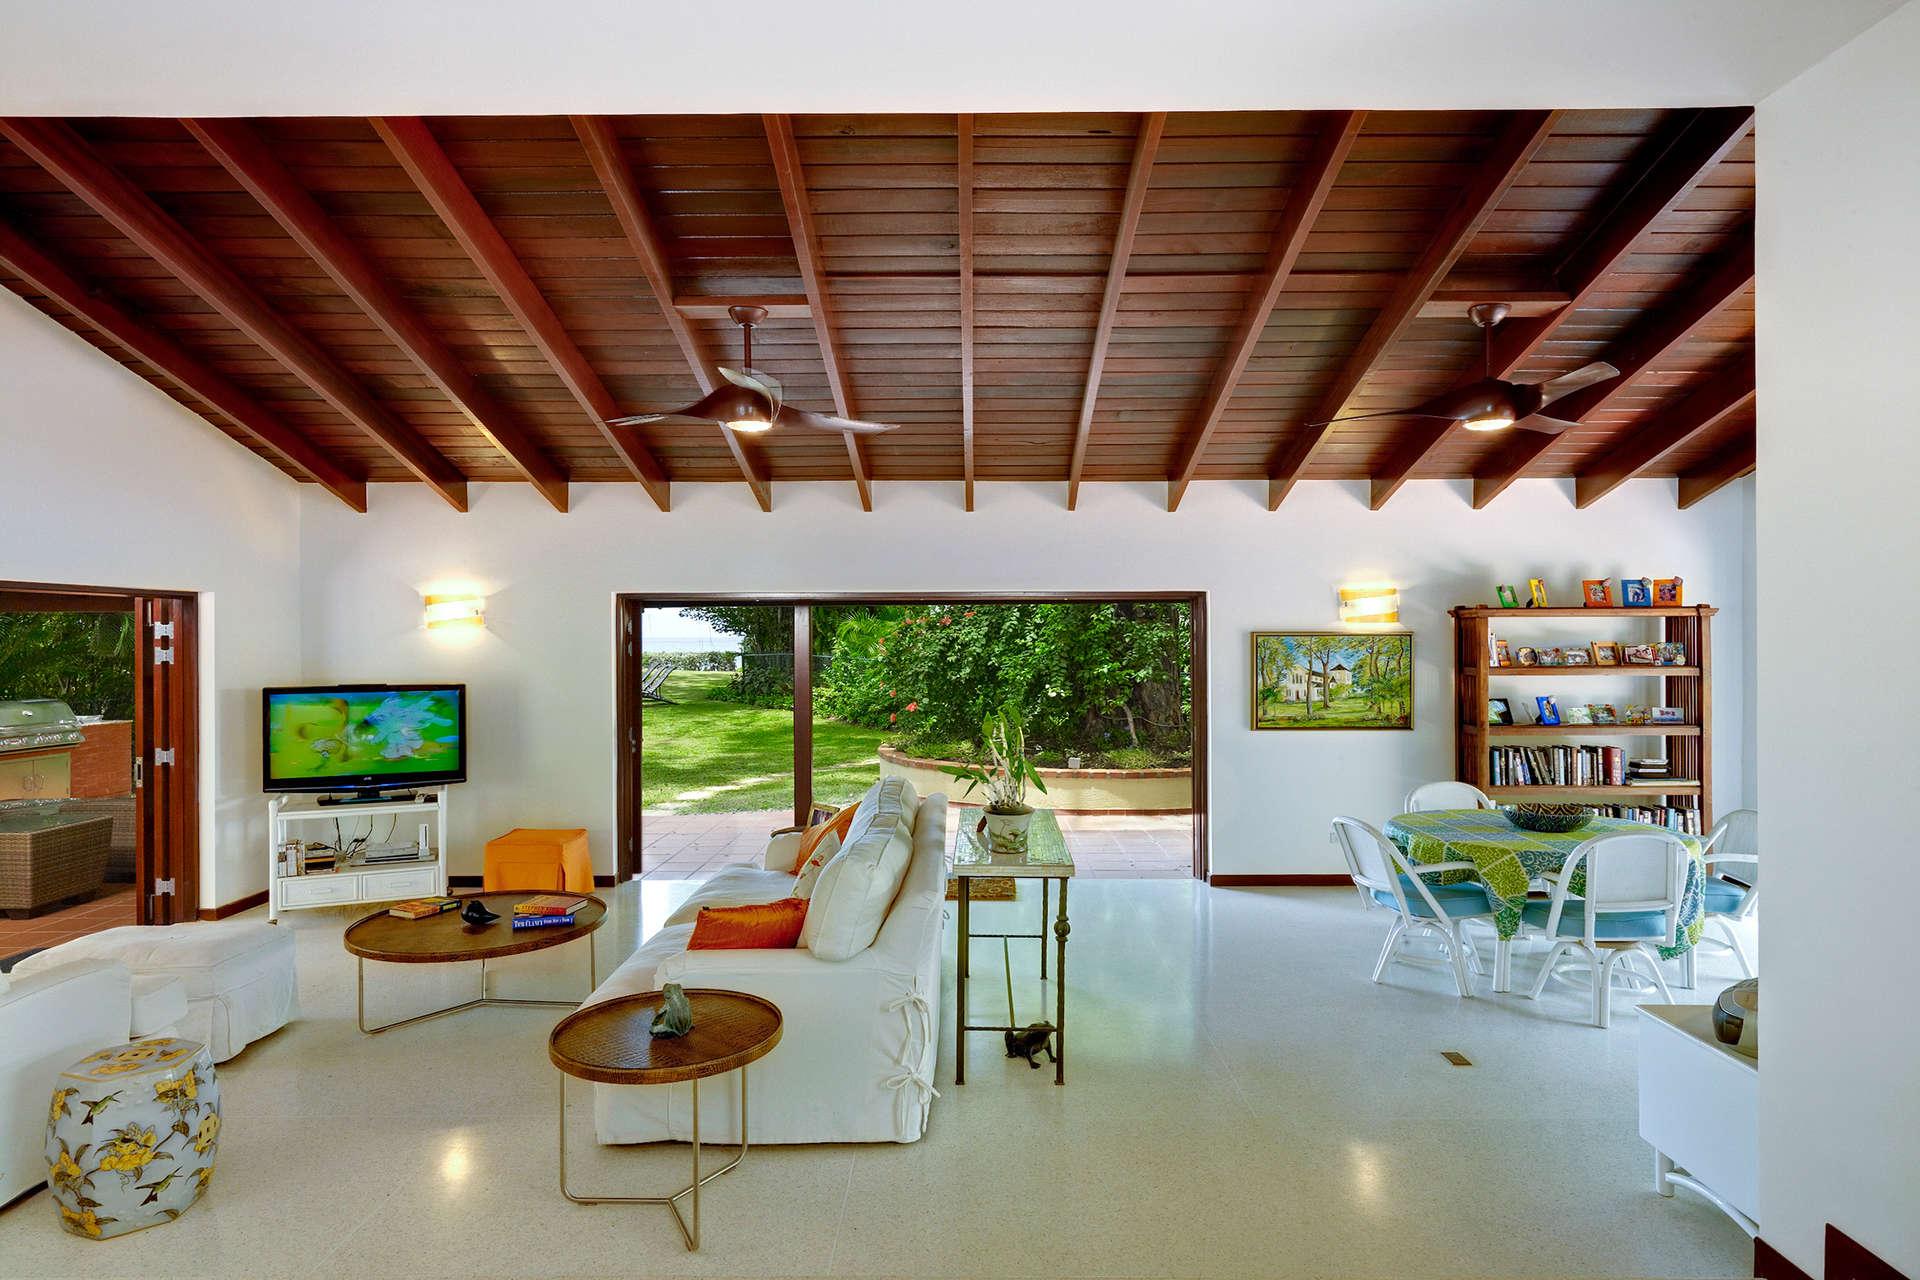 Luxury villa rentals caribbean - Barbados - St james - Holetown st james - Church Point 2 - Image 1/10